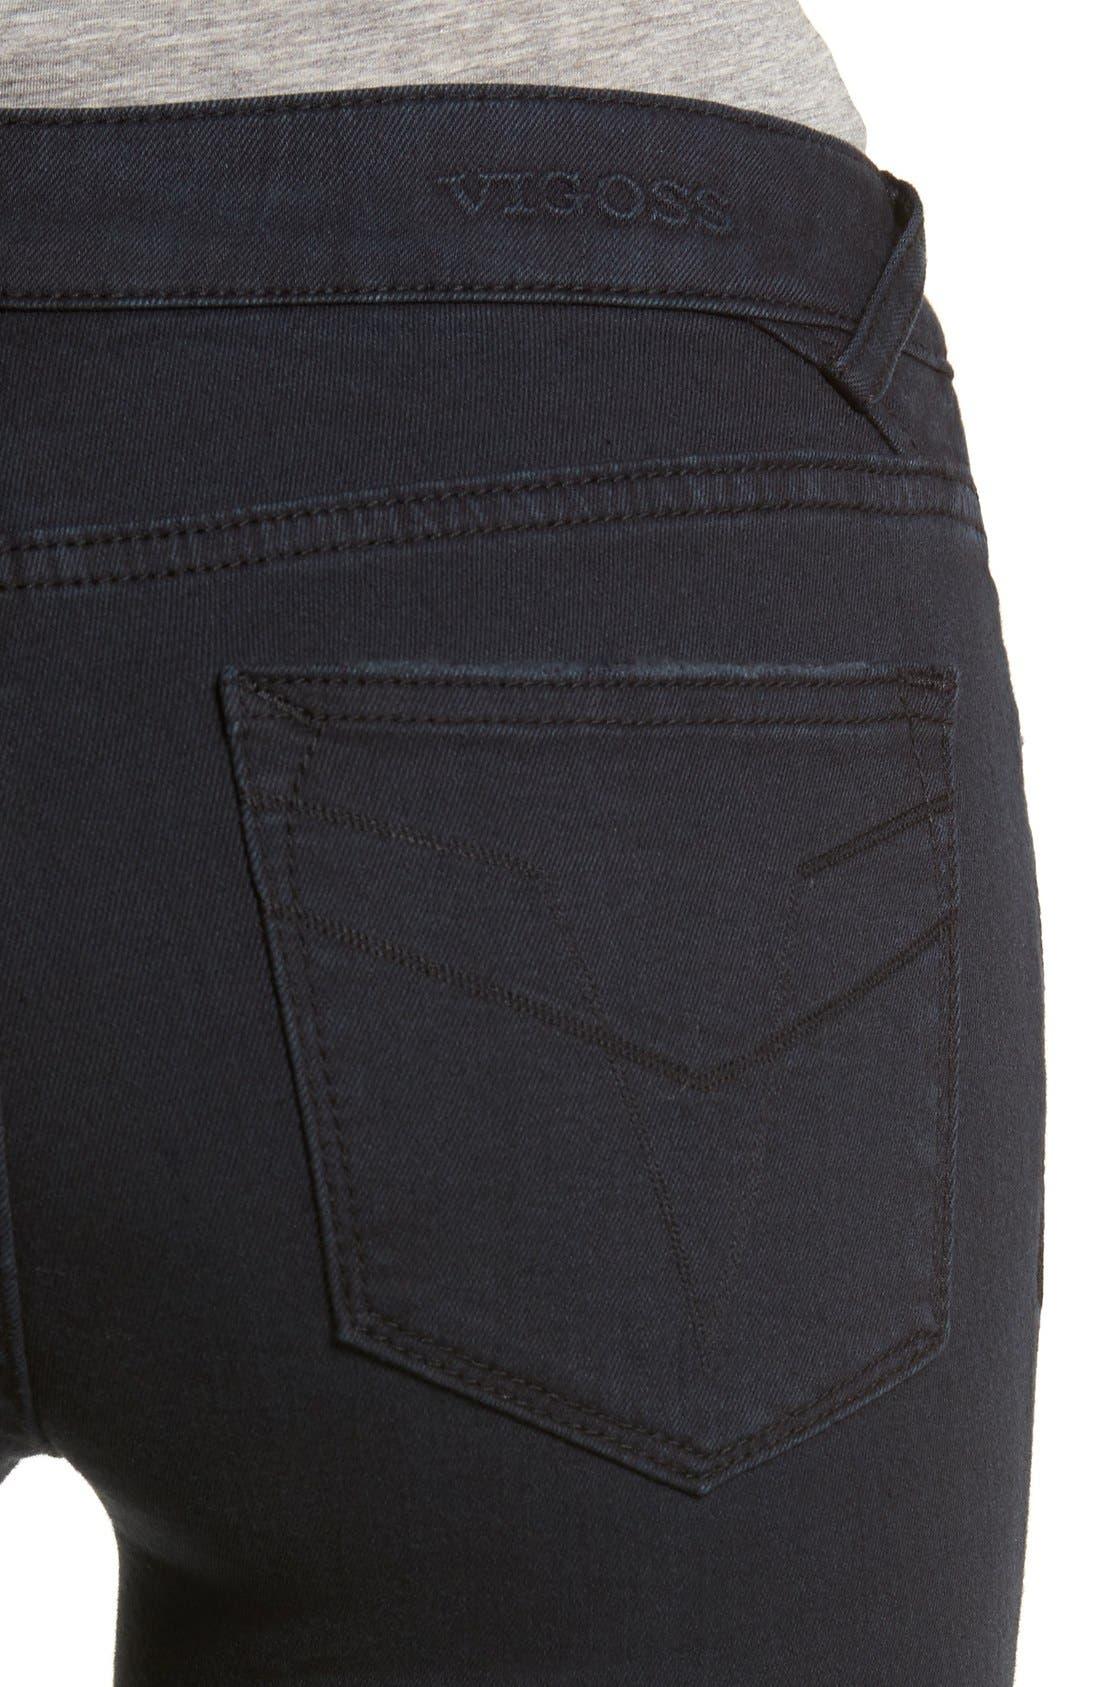 Alternate Image 4  - Vigoss Distressed Zip Skinny Jeans